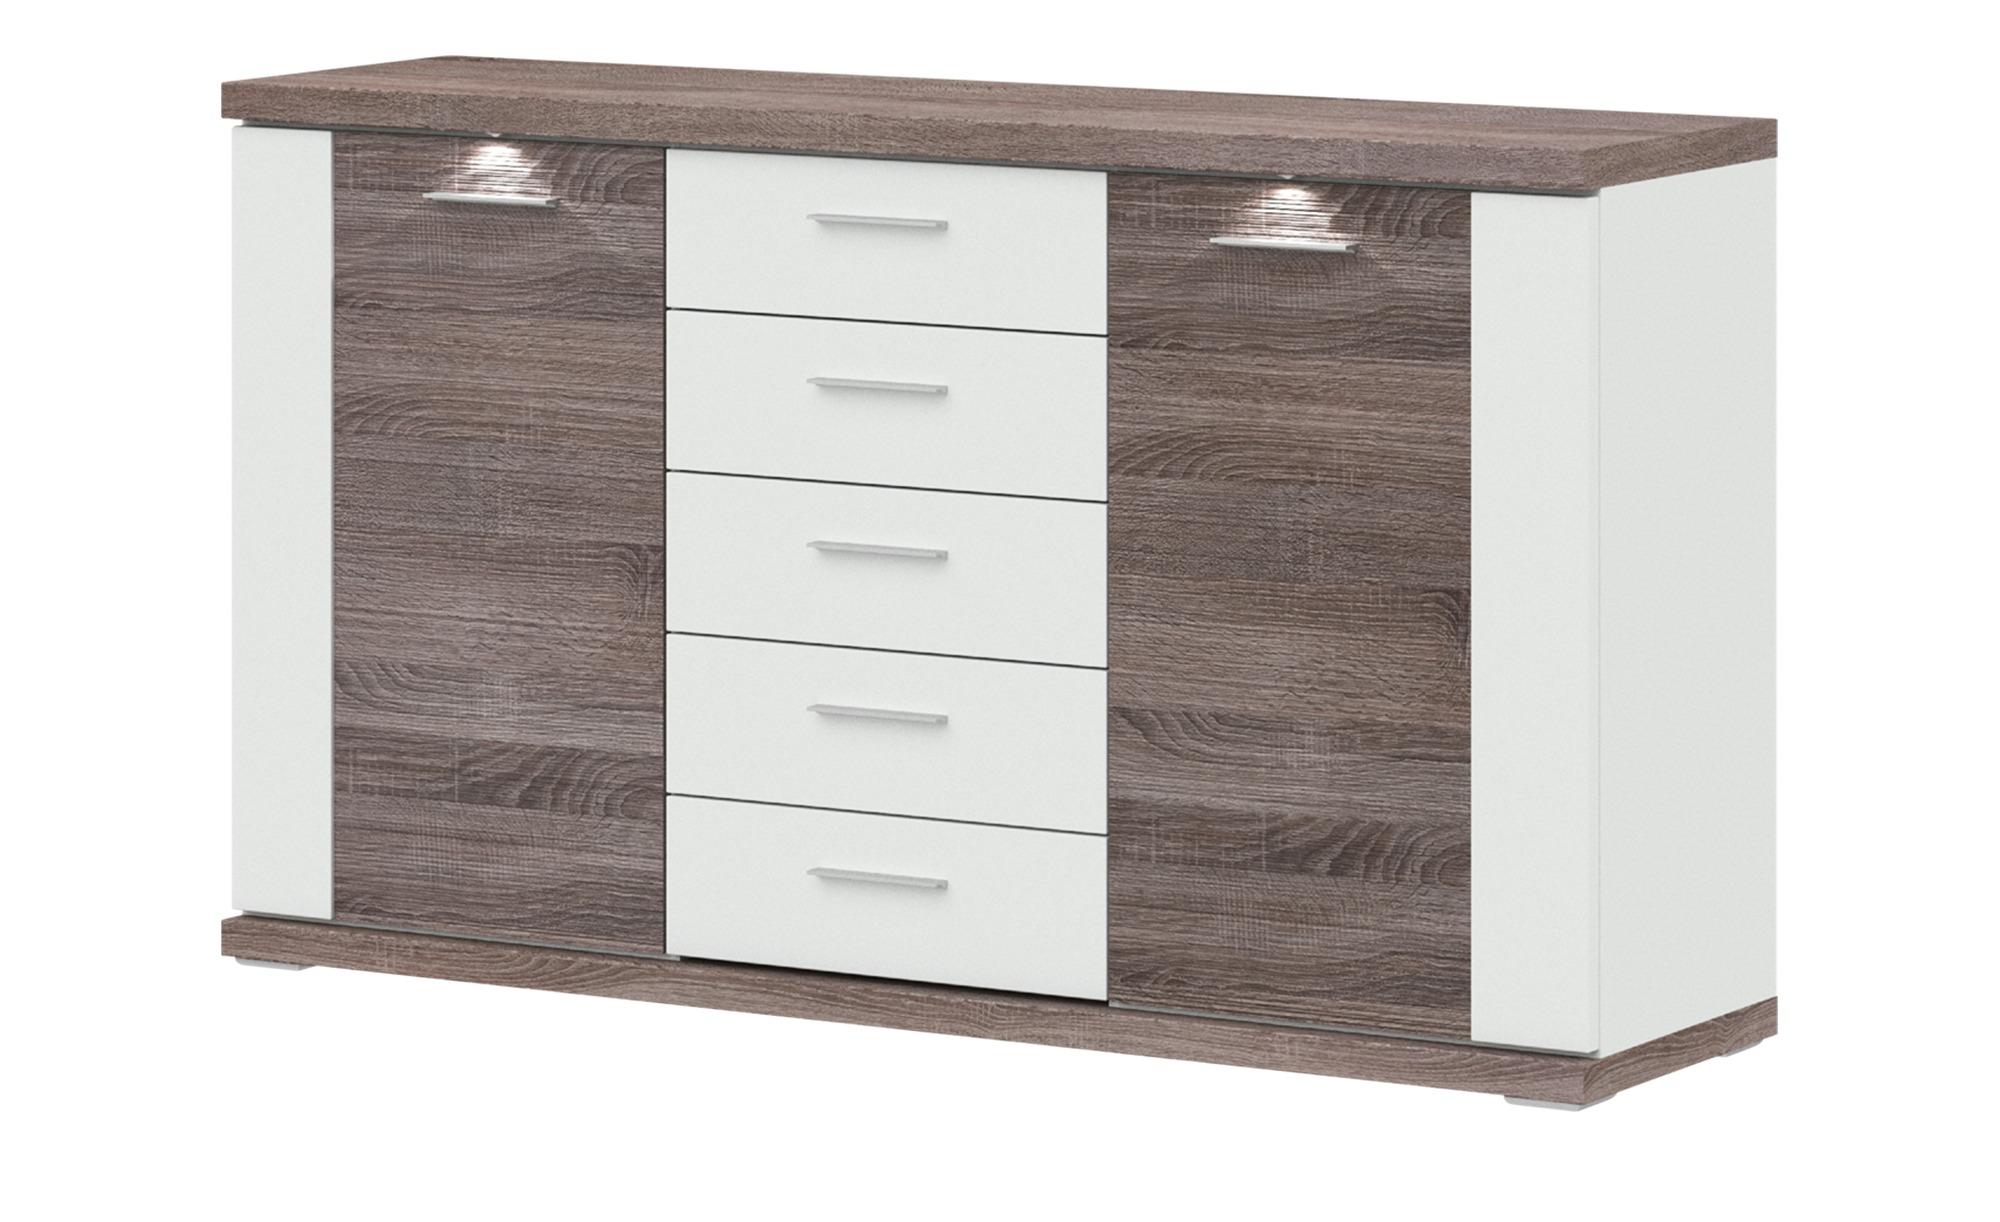 uno Sideboard  Titan ¦ holzfarben ¦ Maße (cm): B: 156 H: 91 T: 42 Kommoden & Sideboards > Sideboards - Höffner